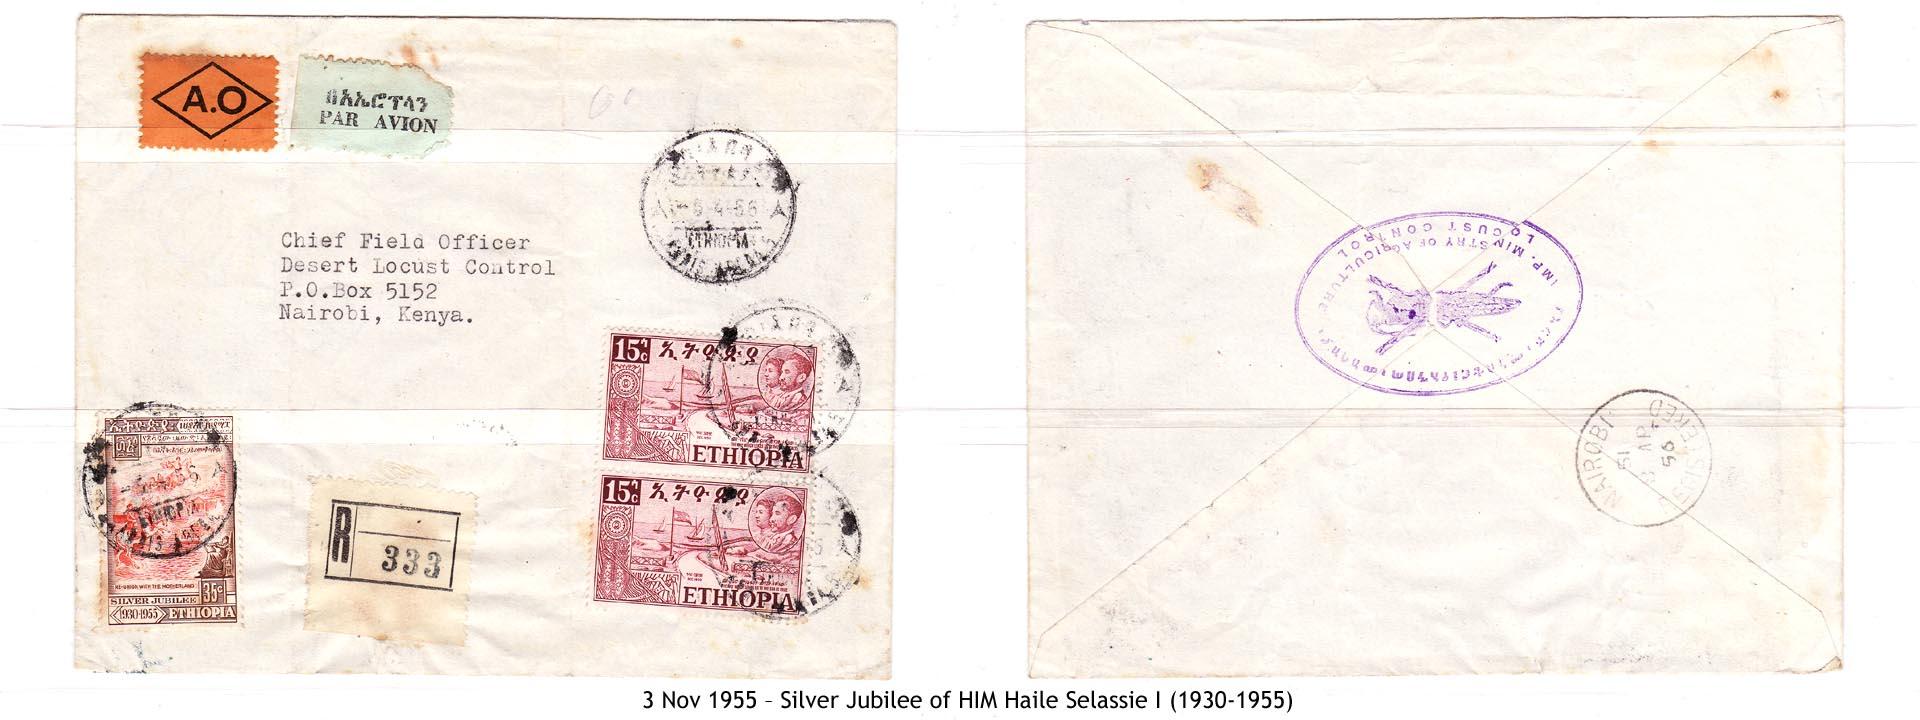 19551103 – Silver Jubilee of HIM Haile Selassie I (1930-1955)